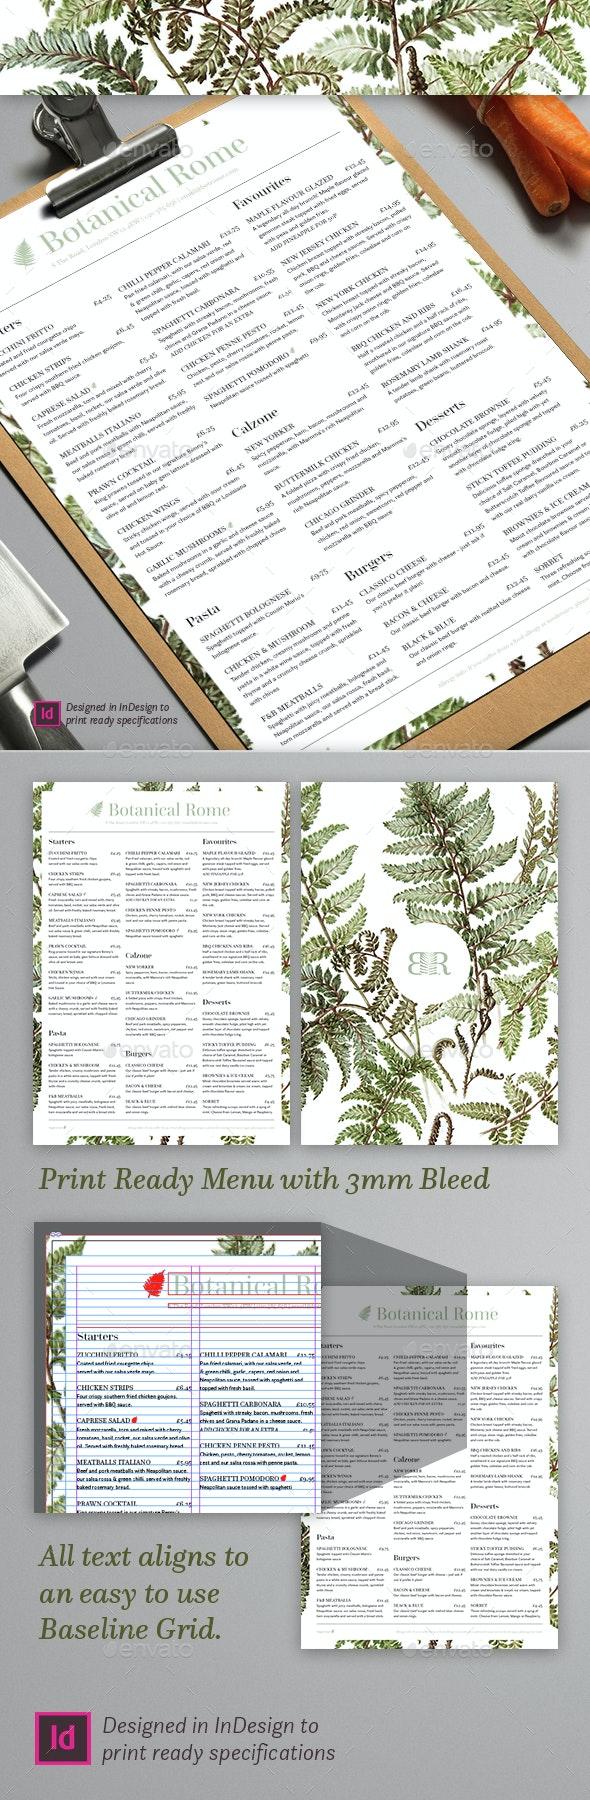 Botanical Restaurant Menu - Restaurant Flyers